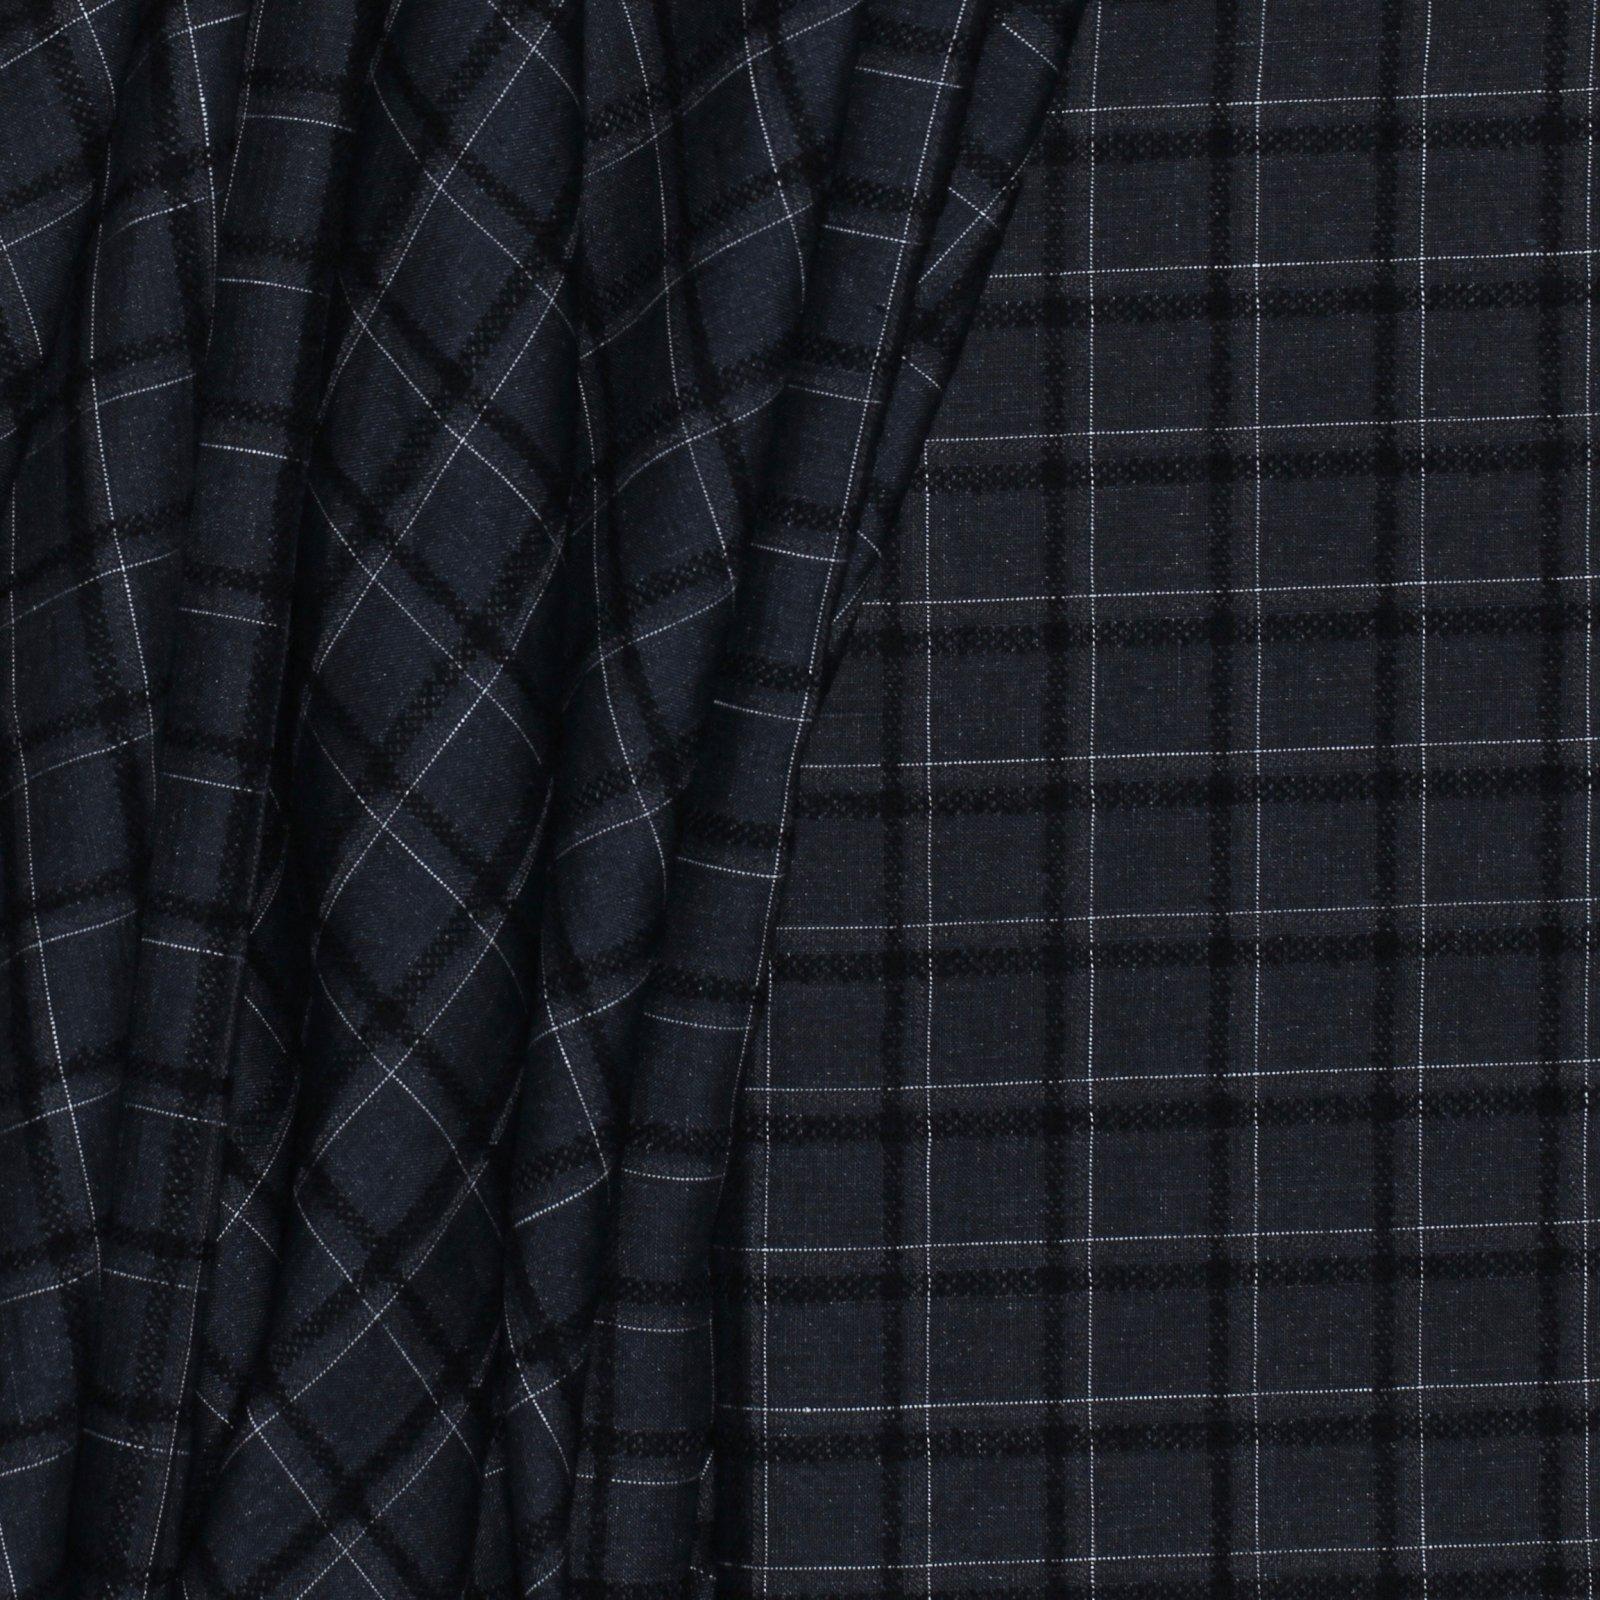 Dark Grey w/Black Jacquard Check Italian Linen